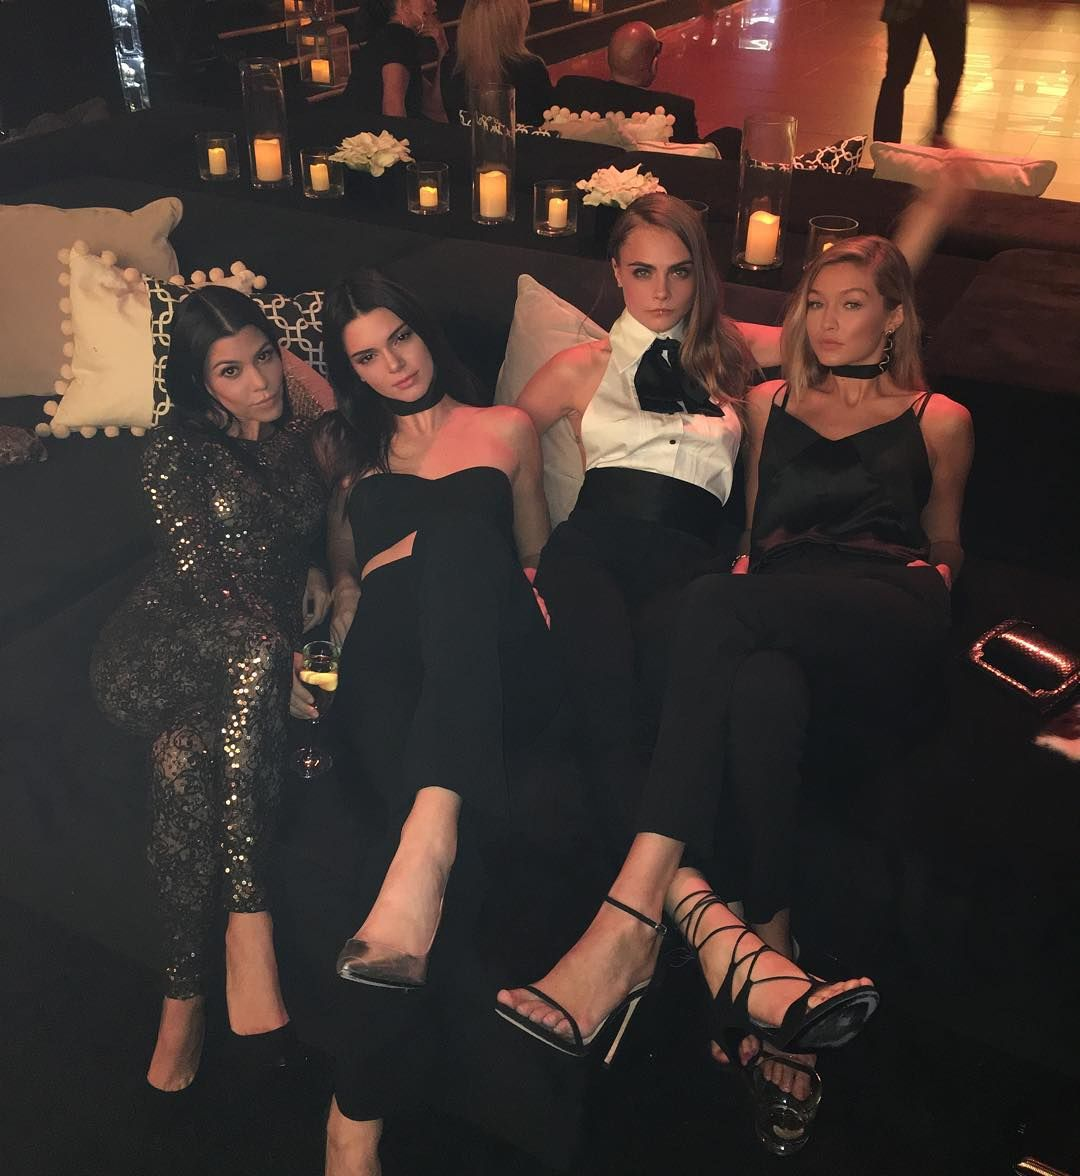 Kendall Jenner, Gigi Hadid Source: Refinery.com